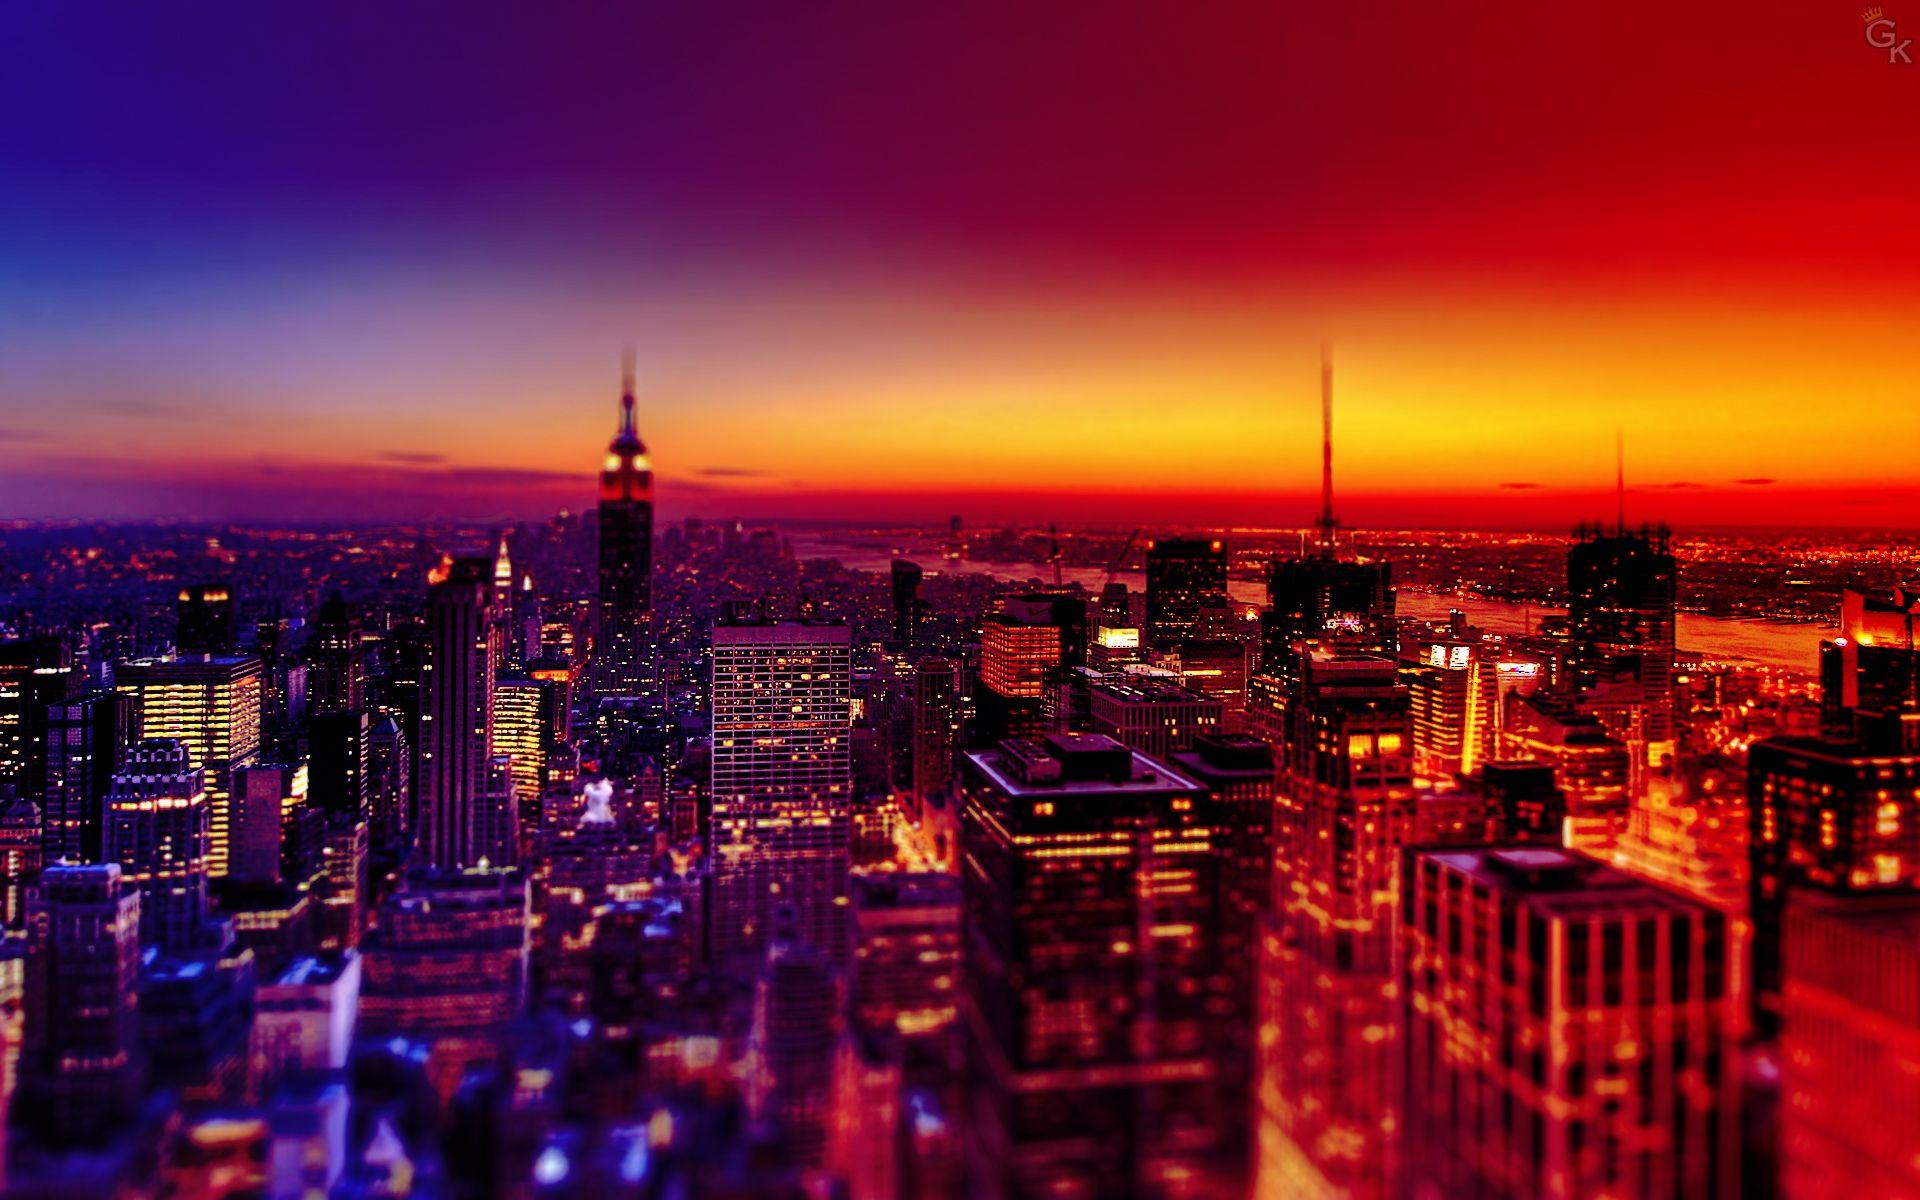 Night City Wallpapers Mobile City Wallpaper Night Landscape City Landscape